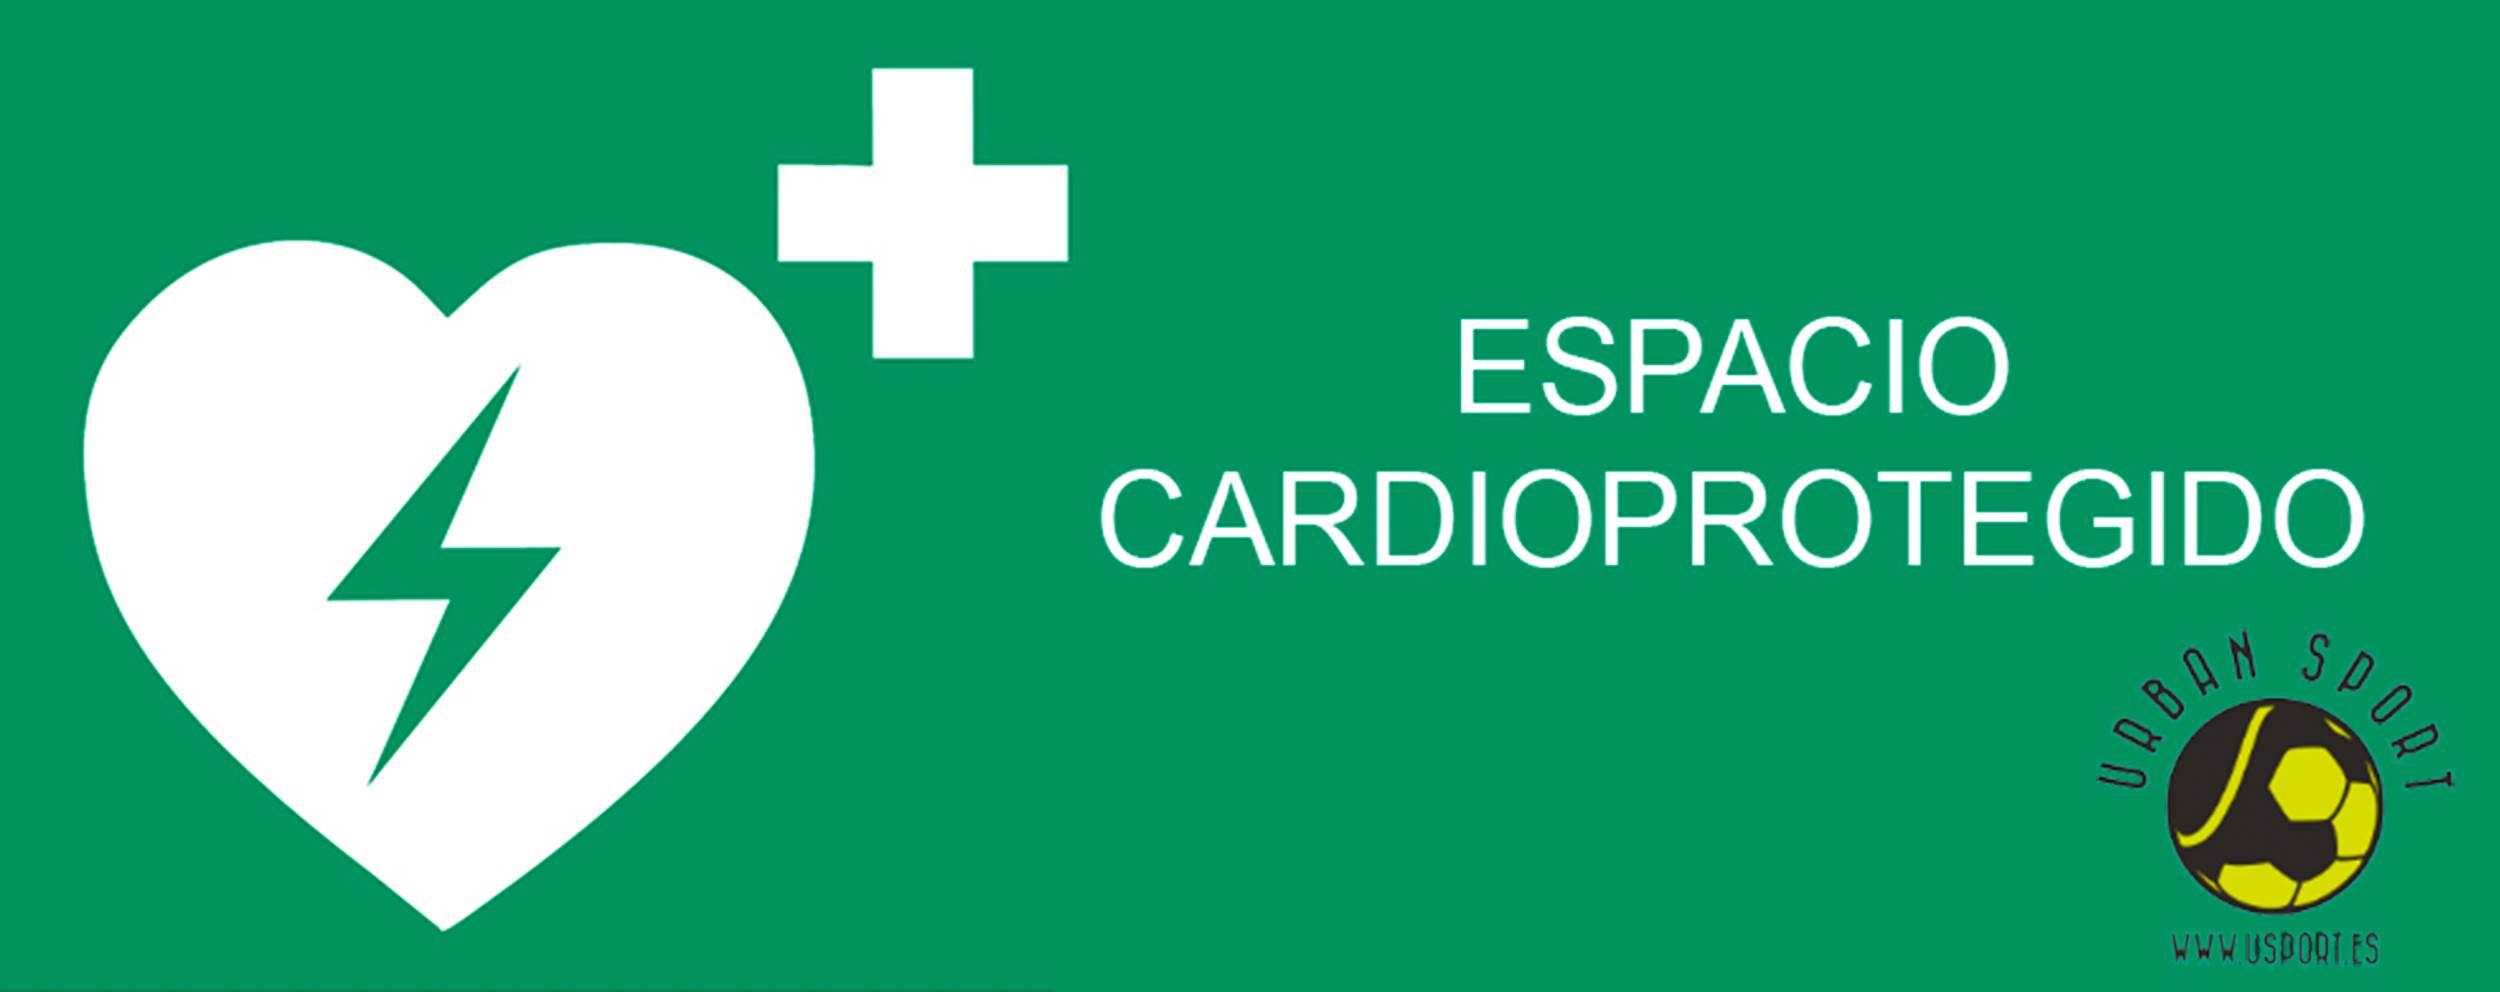 cardioprotegido logo.jpg